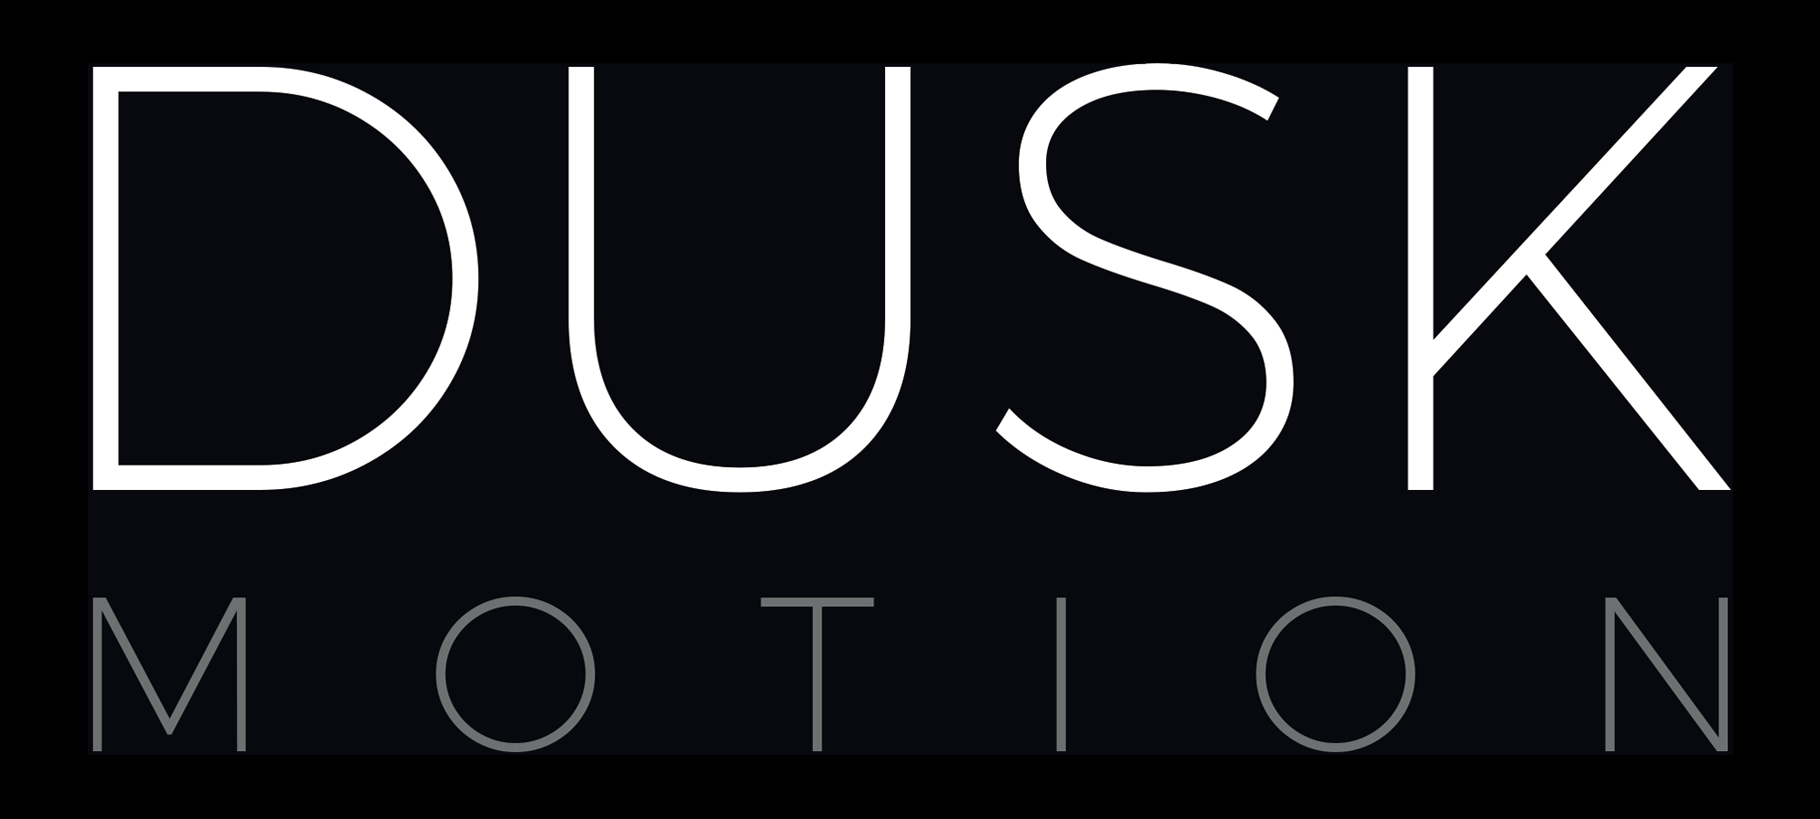 Dusk Motion official name only black background